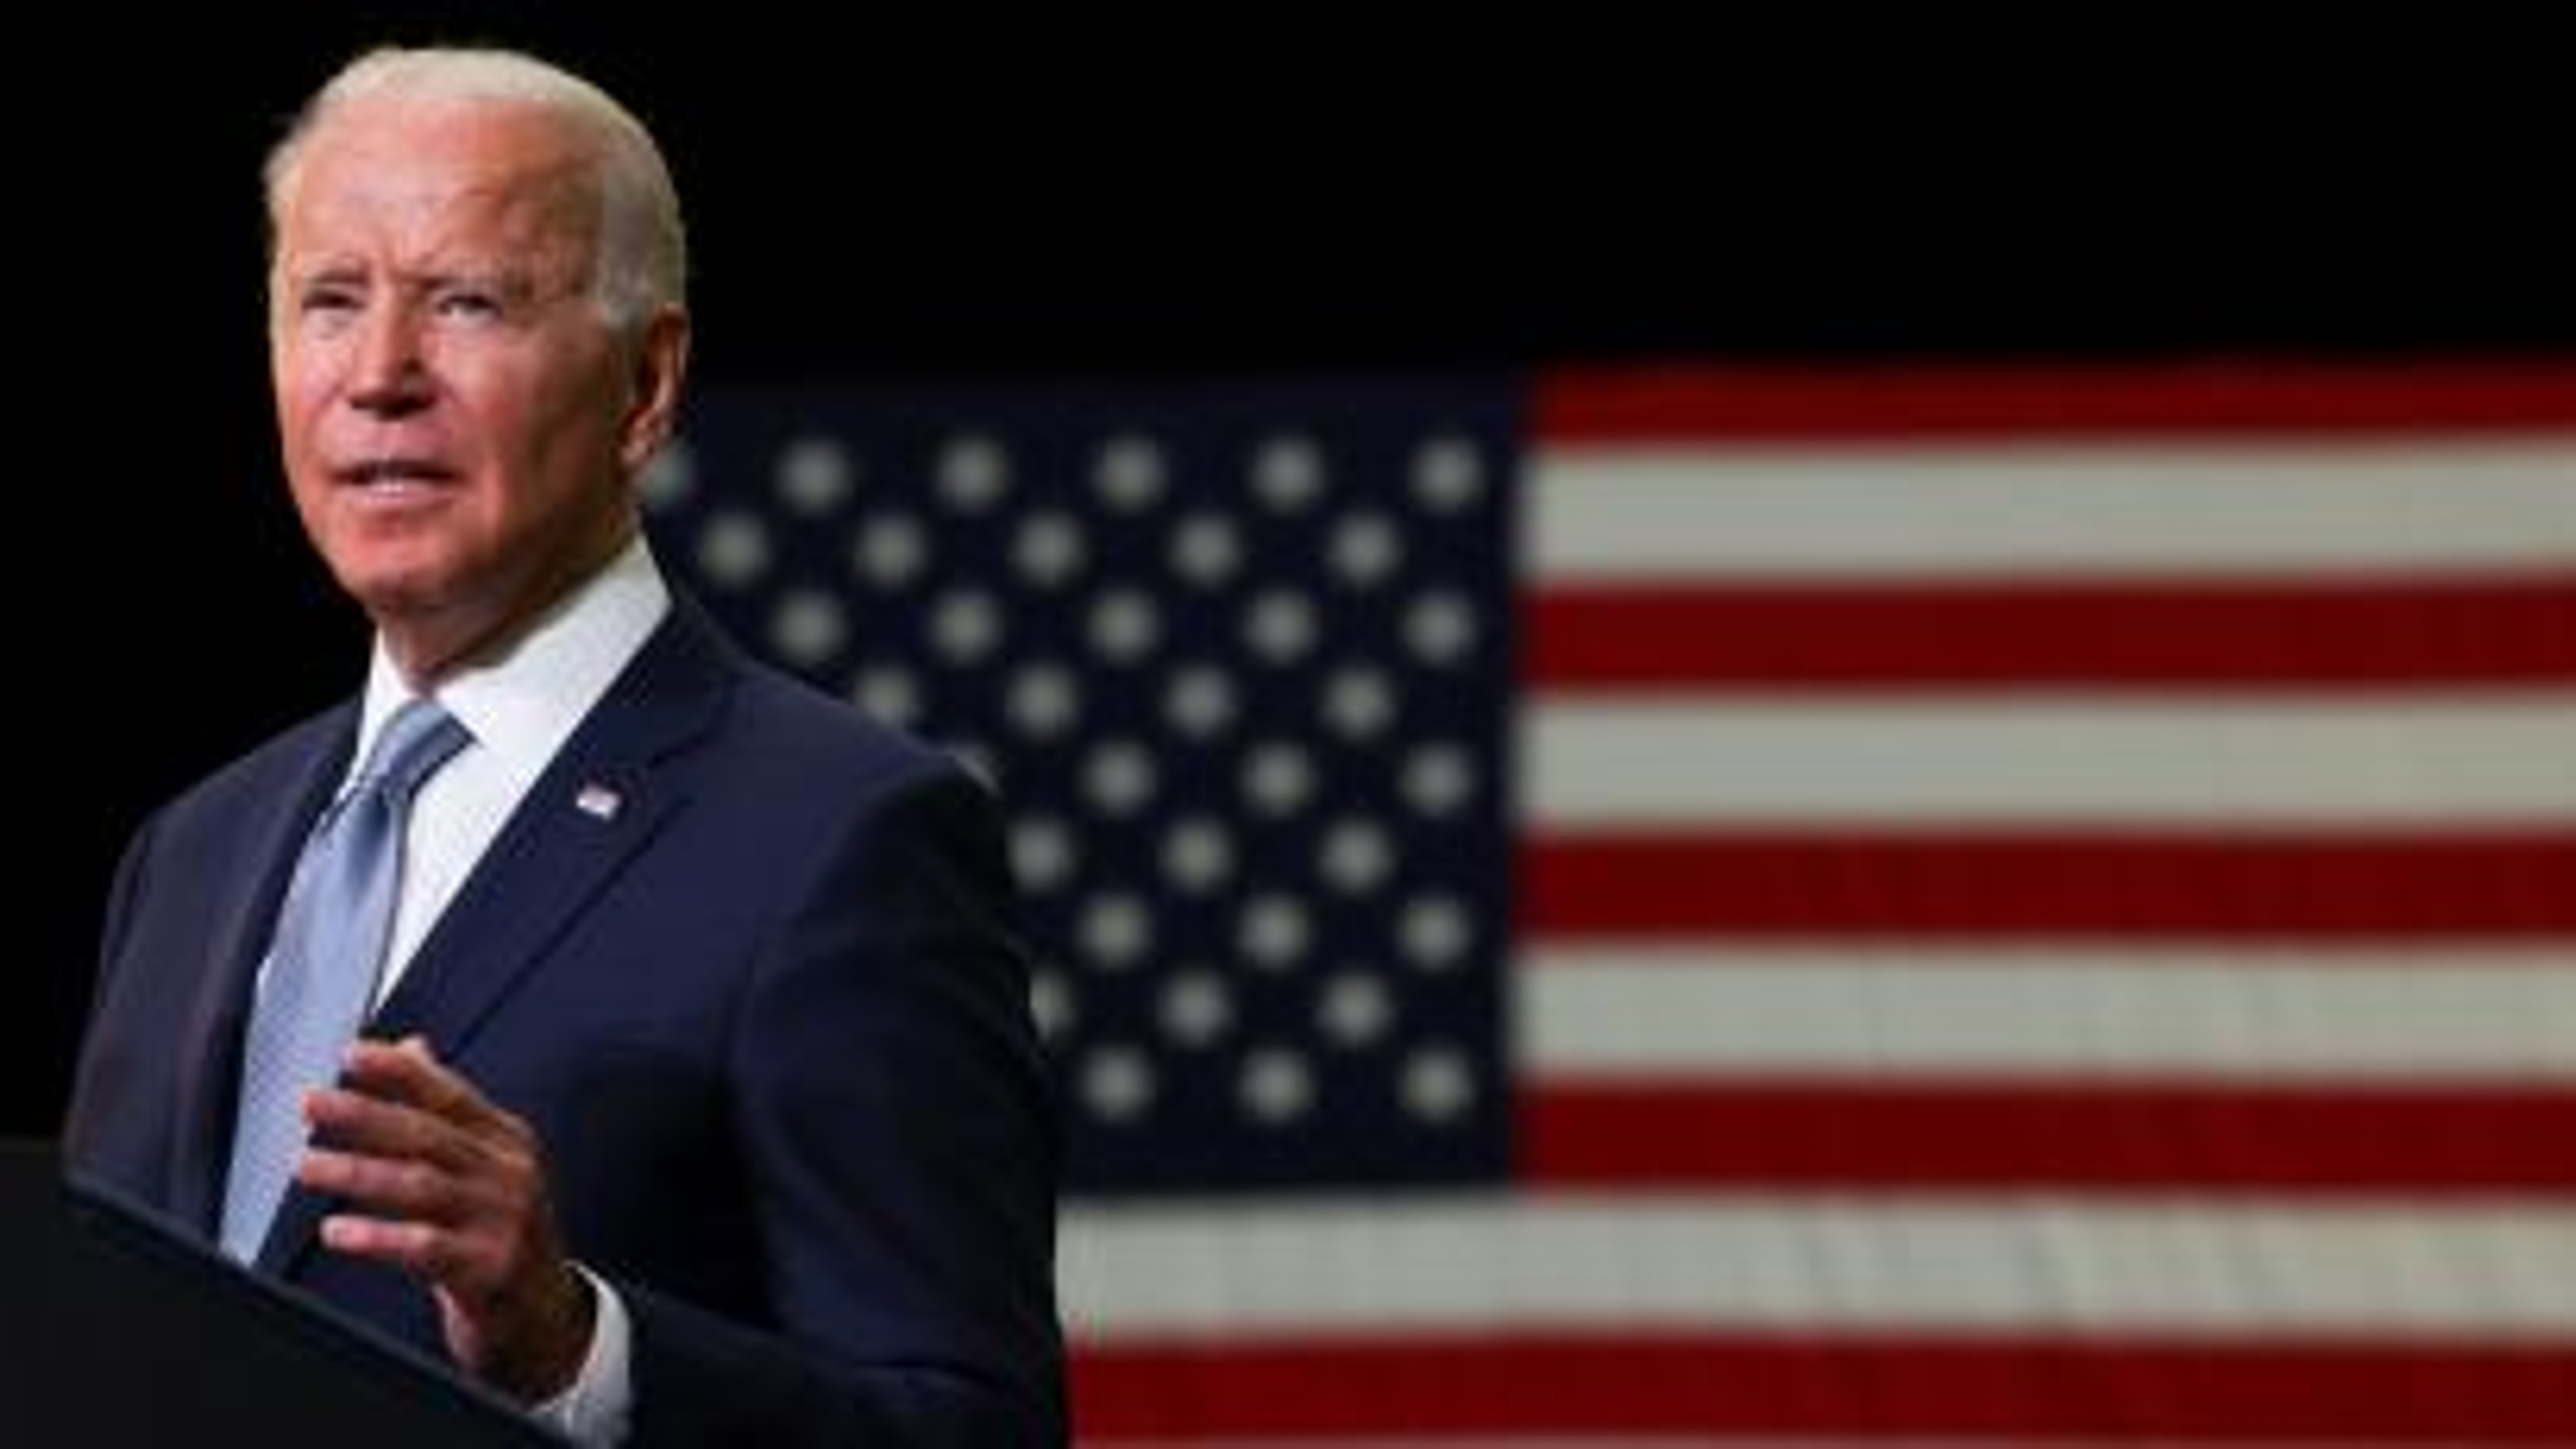 U.S. President Joe Biden visits McHenry County College, in Crystal Lake